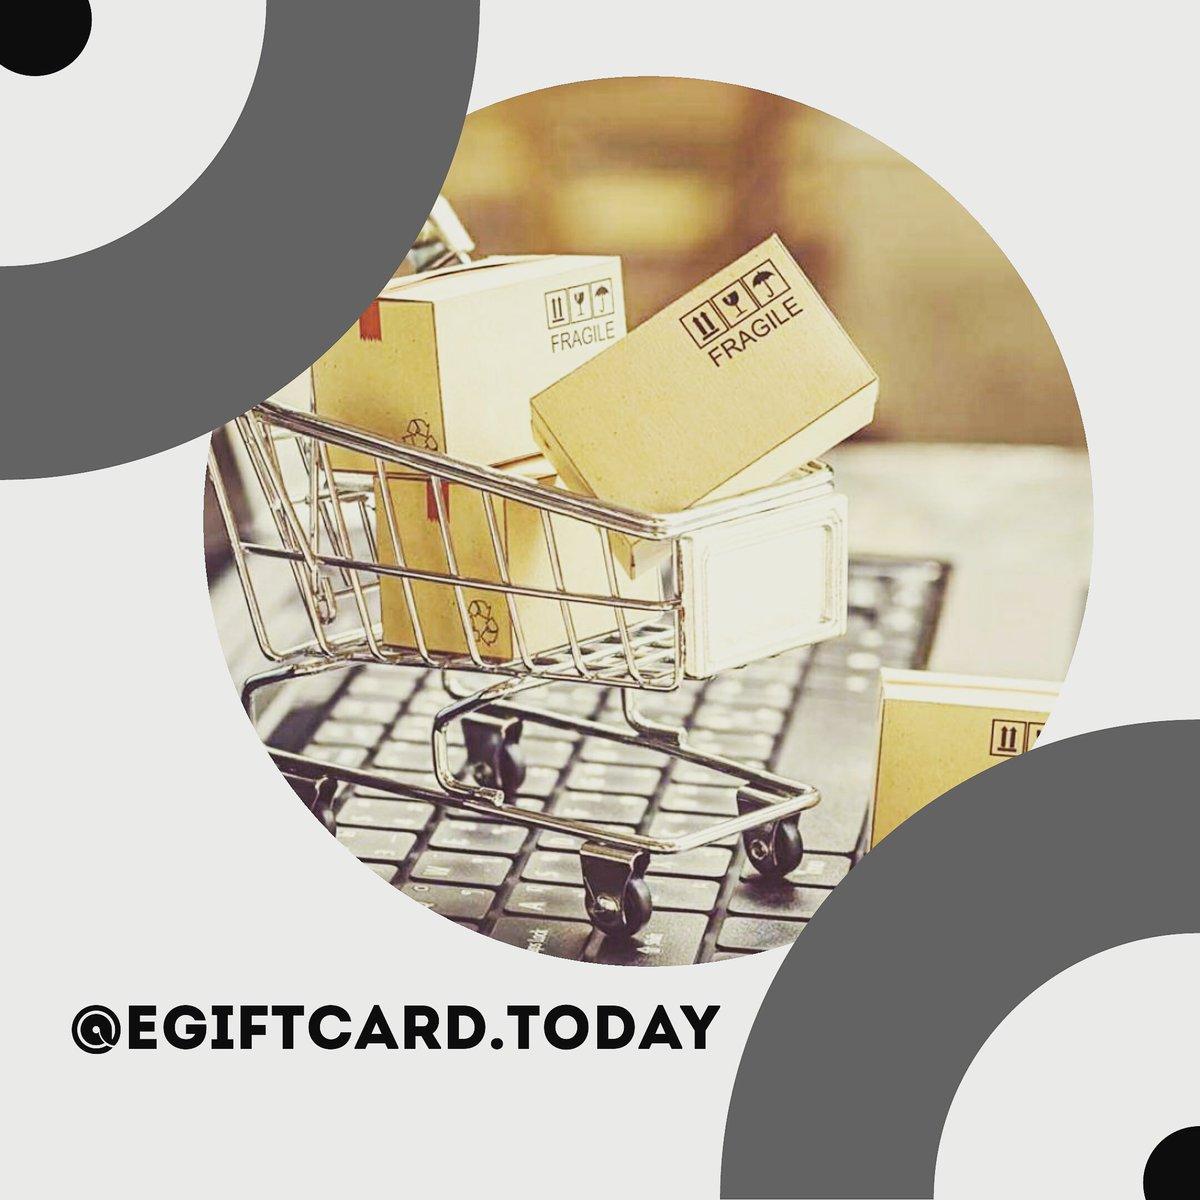 #FelizLunes #Caracas #Amazon #GiftCard https://t.co/DcWcgBxMAD